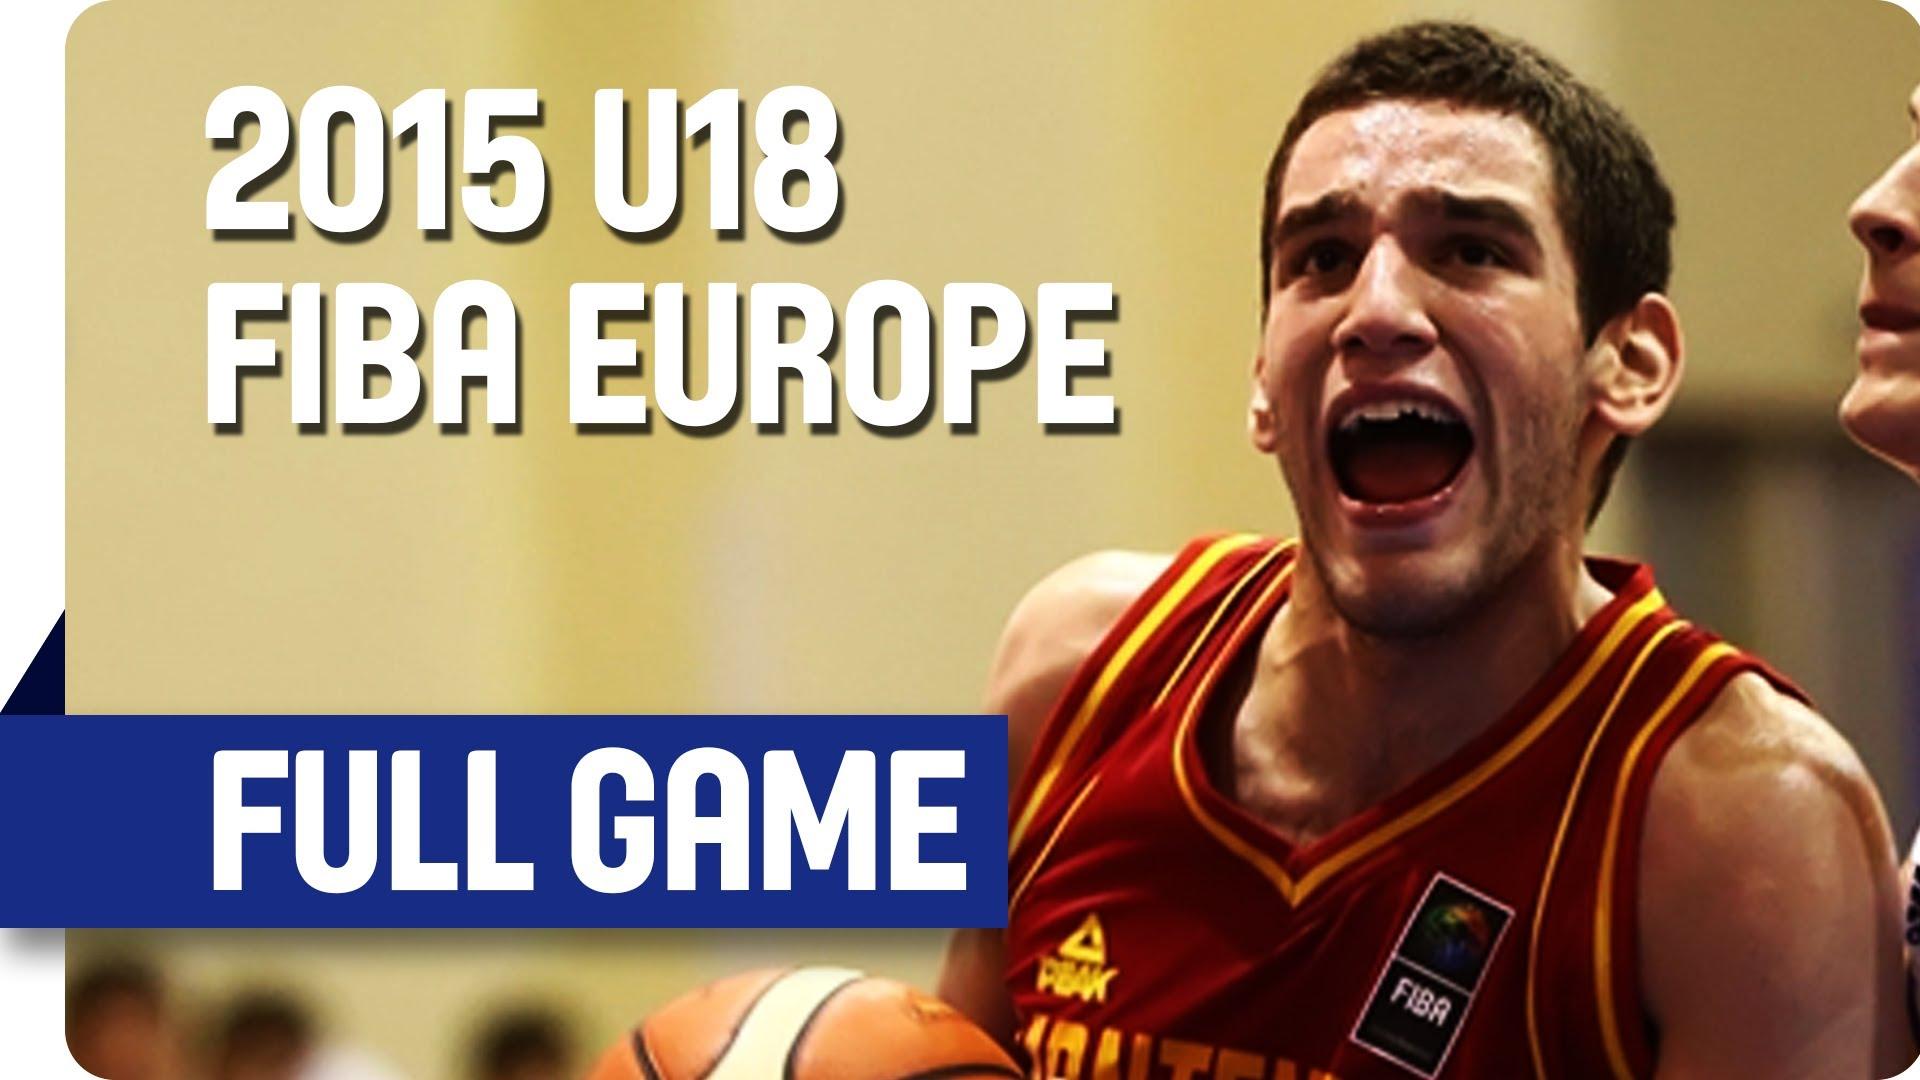 Latvia v Montenegro - Classification 9-16 - Live Stream - 2015 U18 European Championship Men